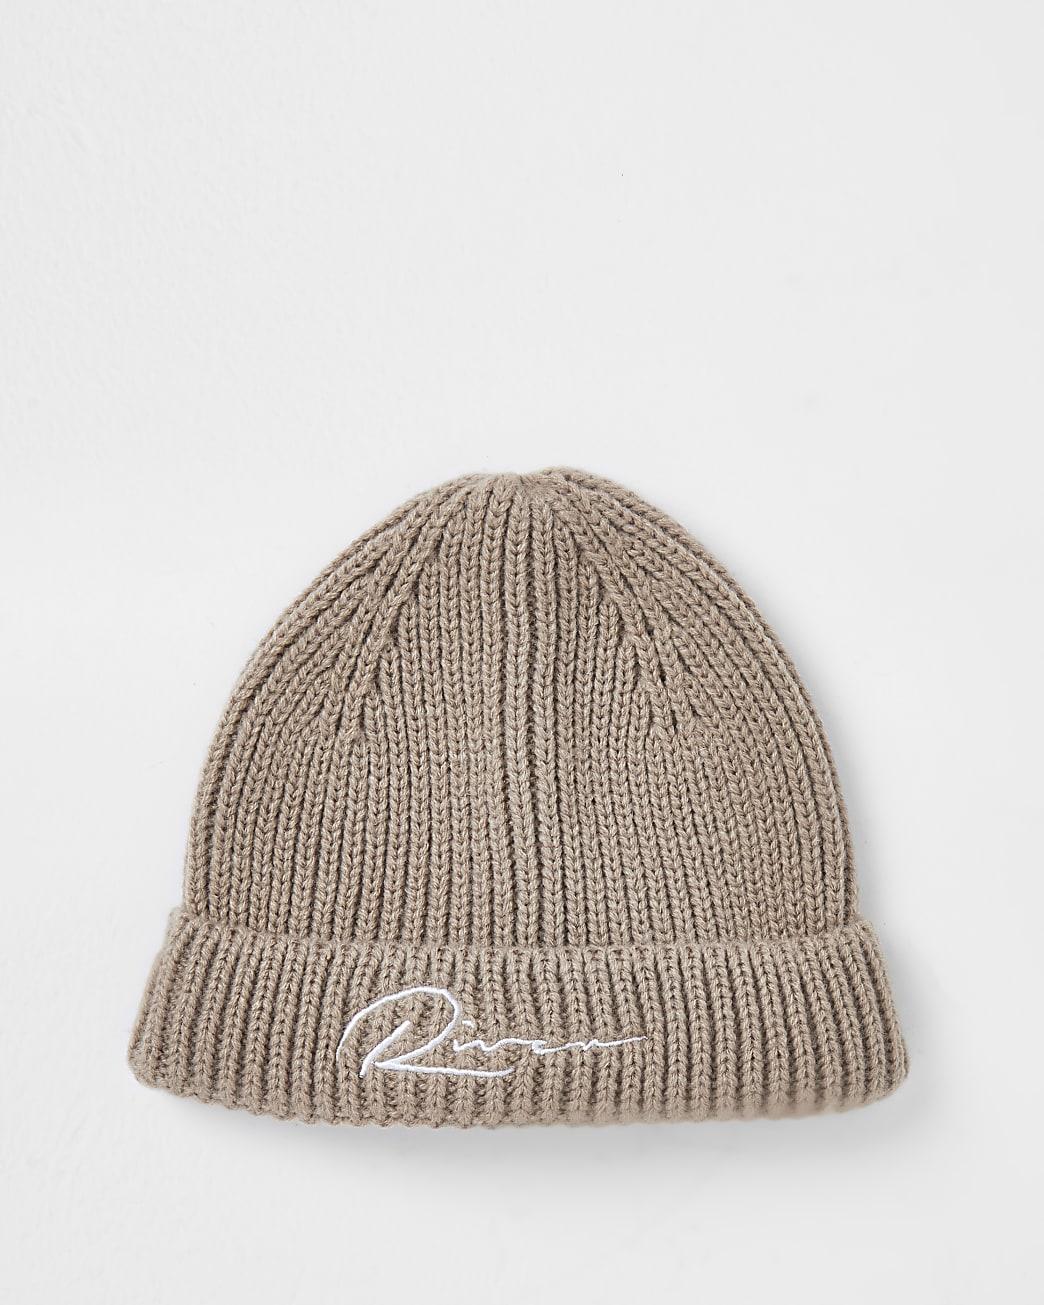 Stone river knitted docker beanie hat